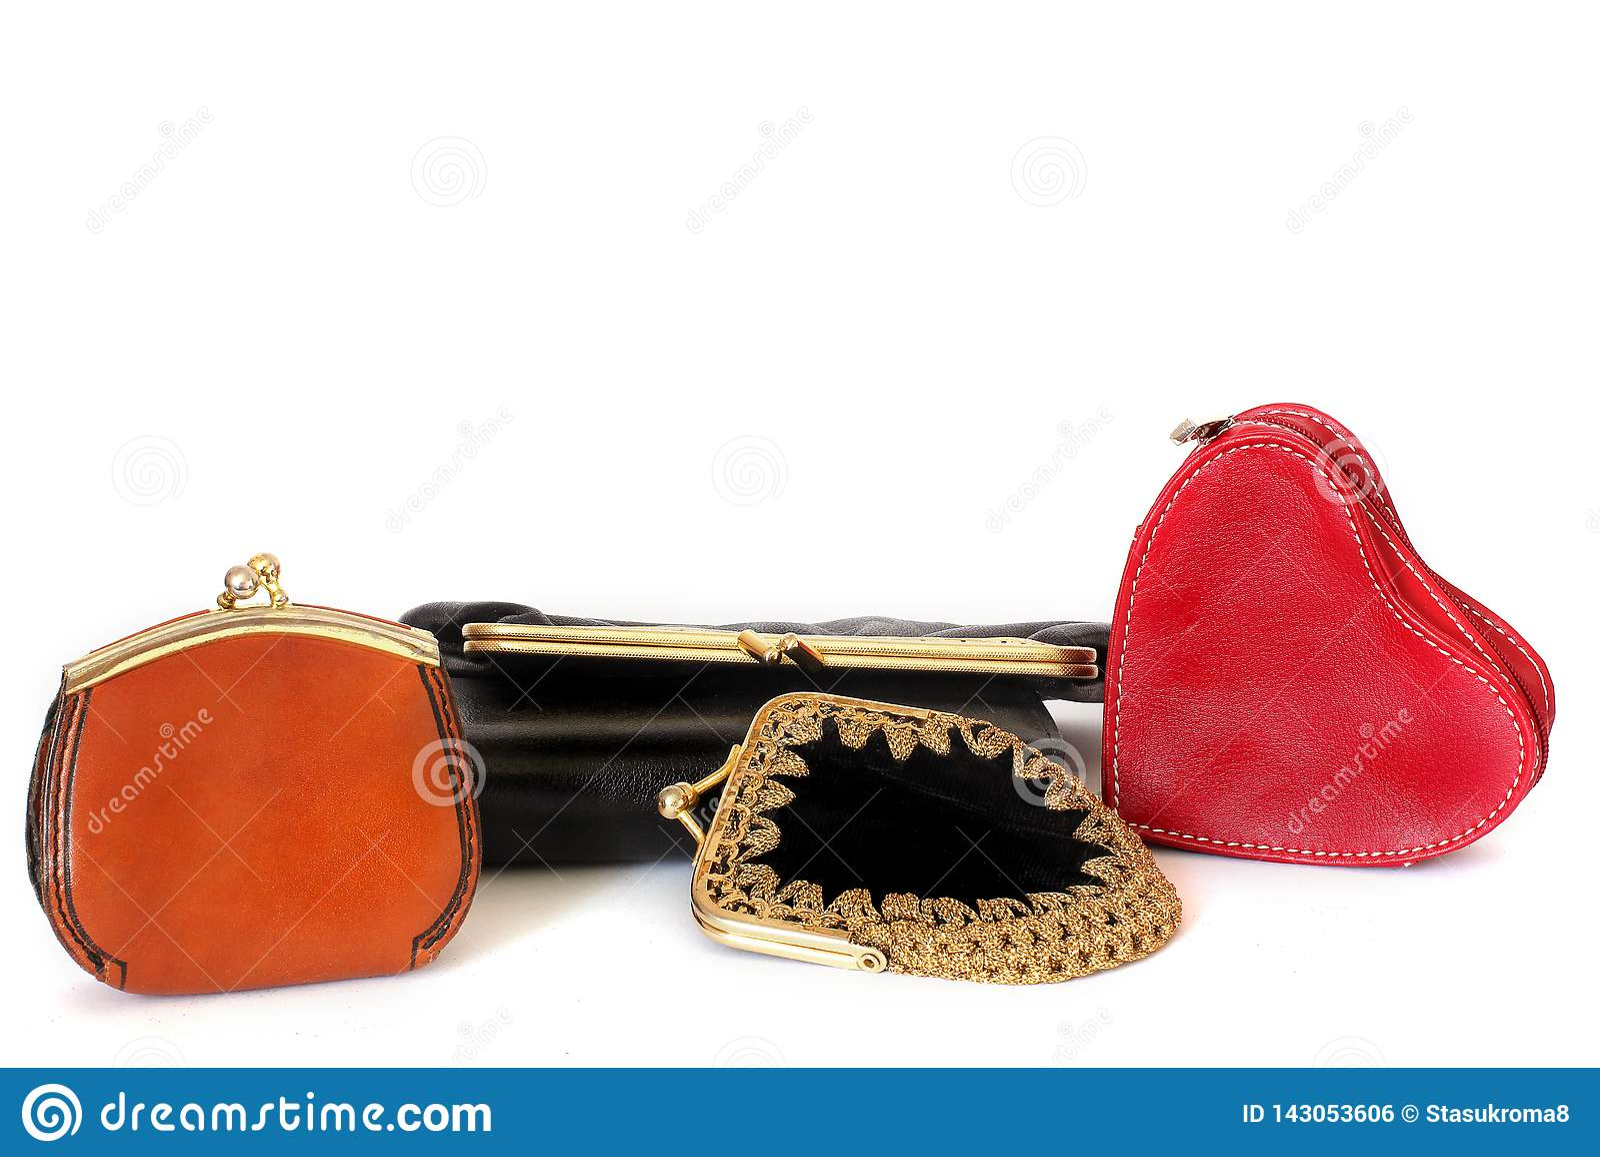 Ladies handbags. Ladies Wallet for little things. Many handbags. Style. Fashion. beauty